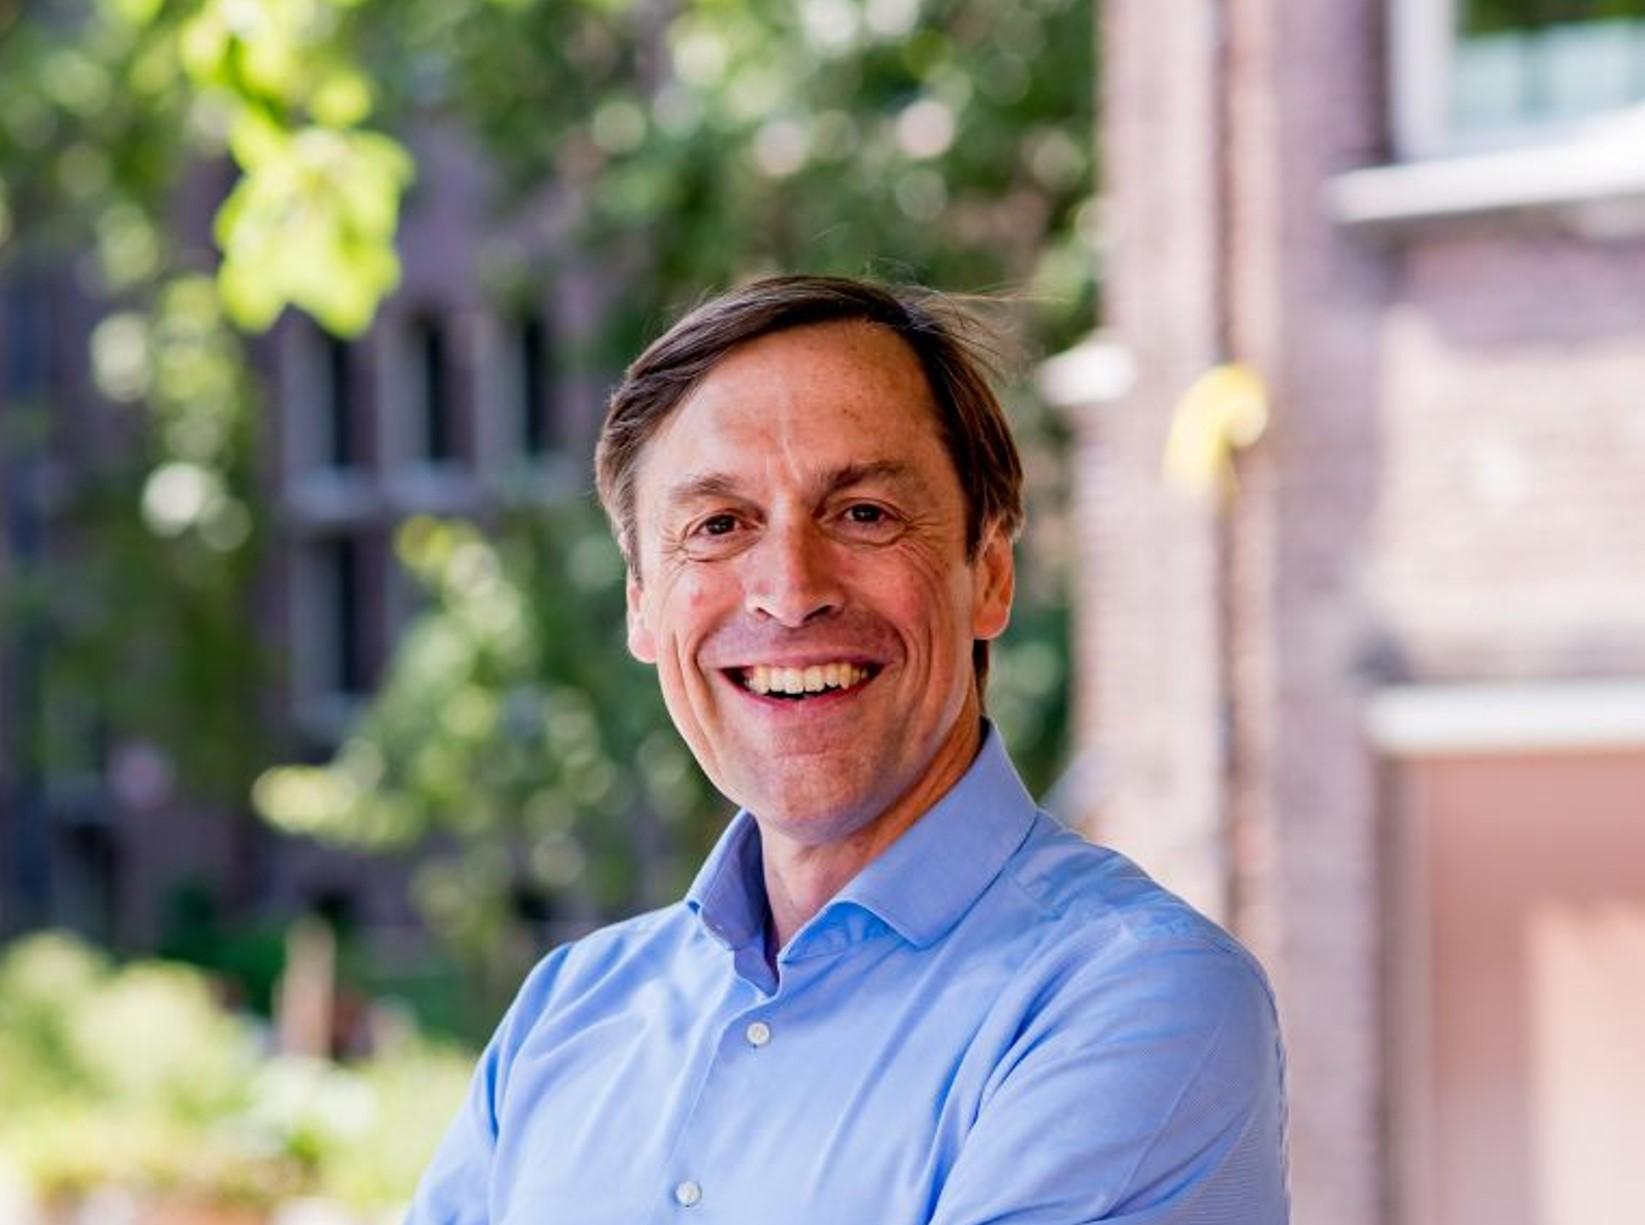 Jeroen Rijpkema nominated as Chief Executive Officer Triodos Bank